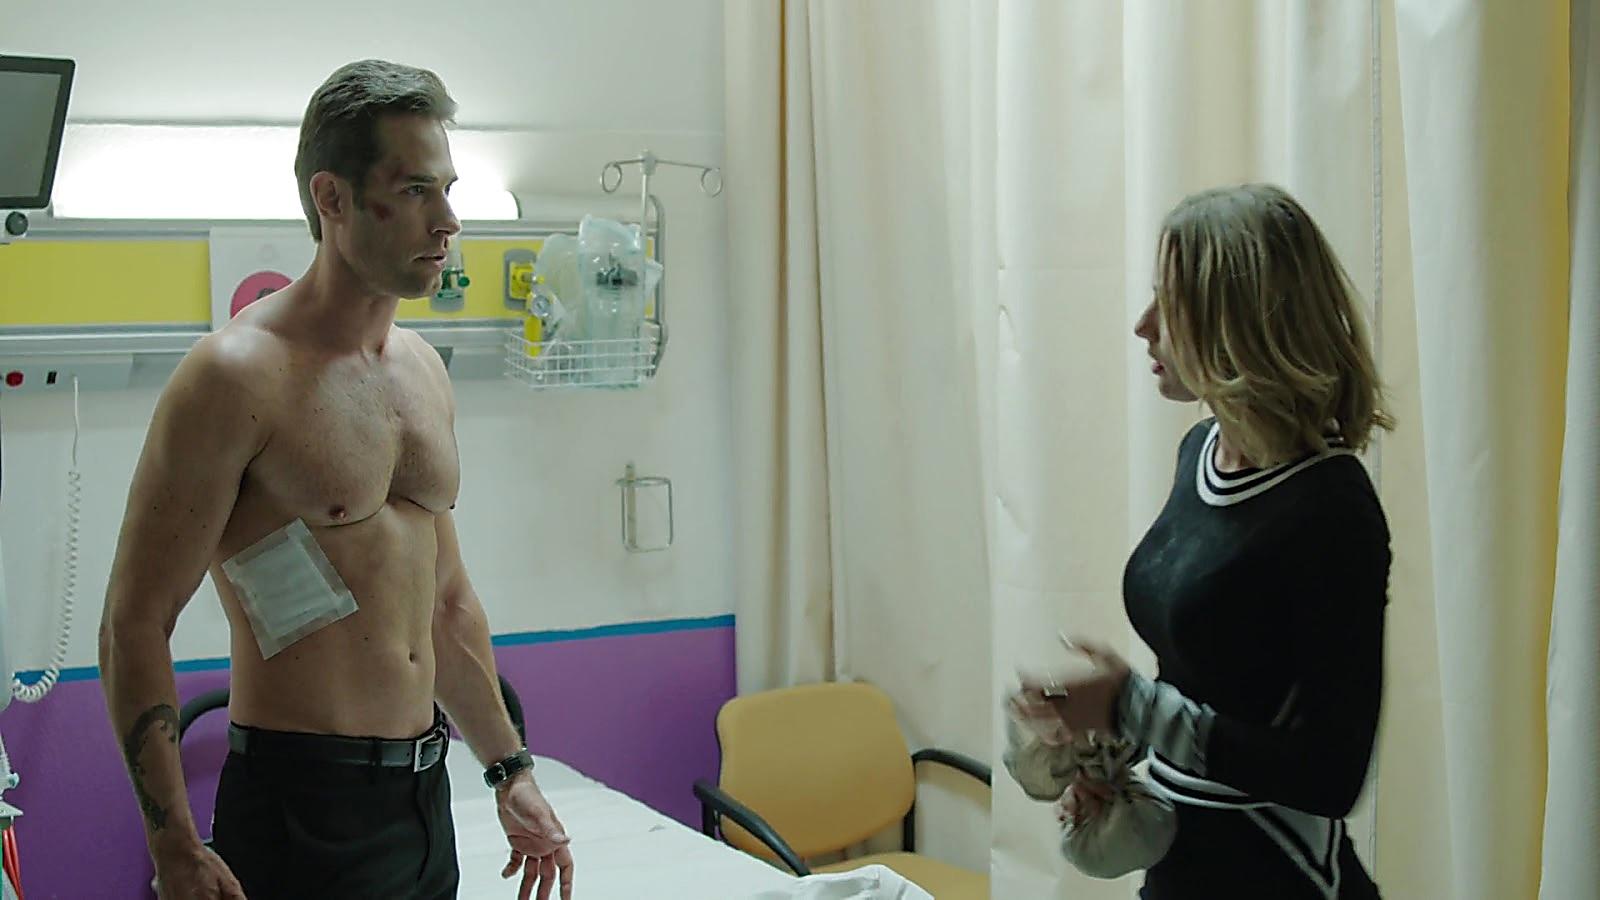 Sebastian Rulli sexy shirtless scene December 23, 2019, 3pm